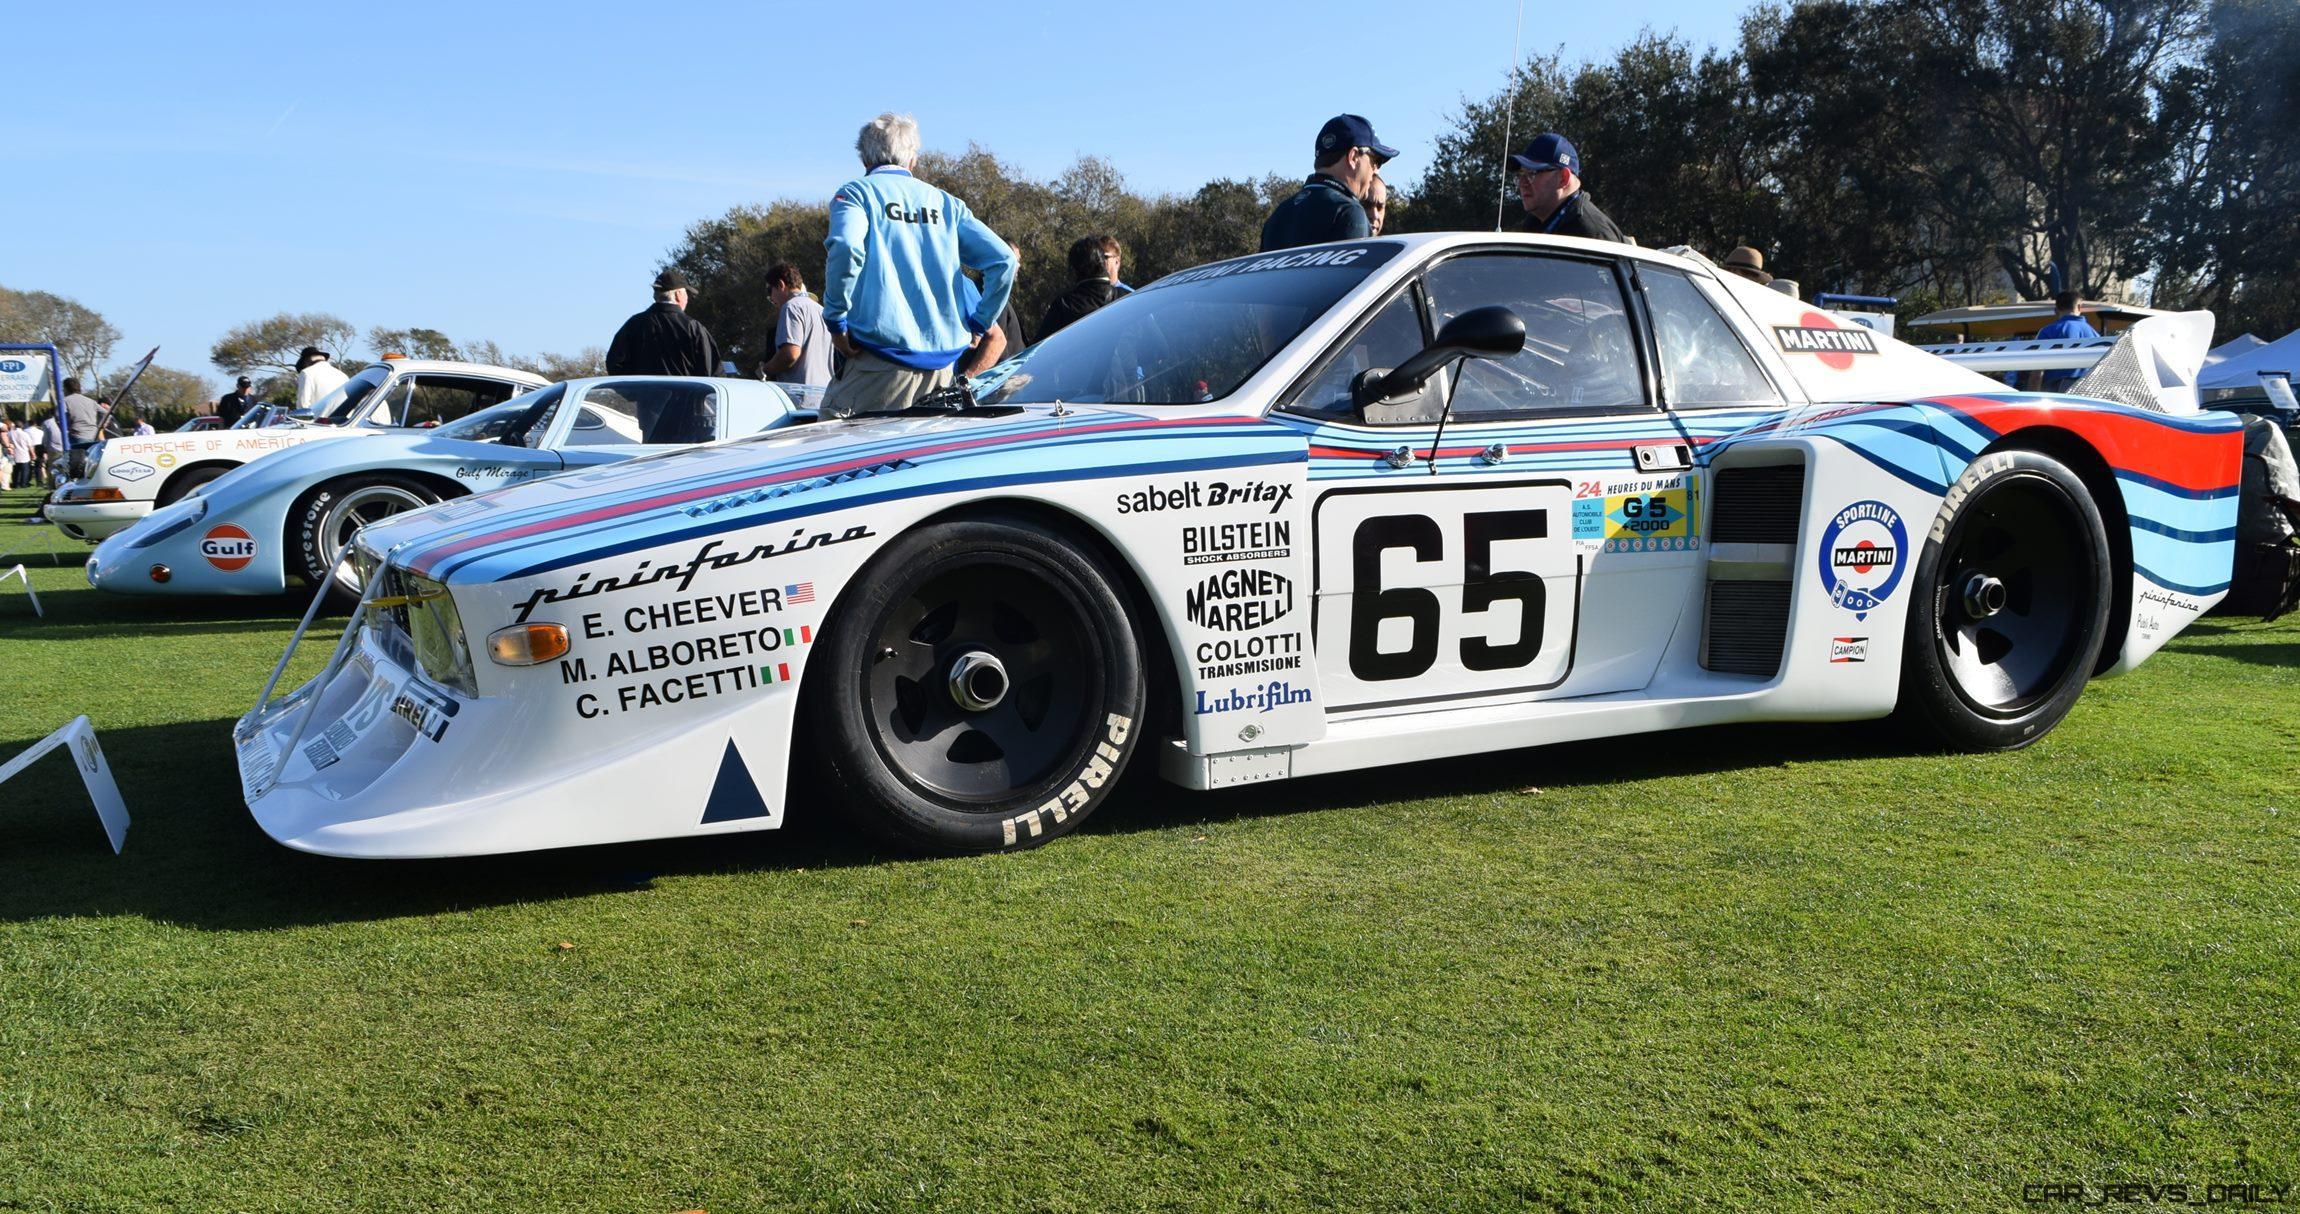 1981 Lancia Beta Monte Carlo Turbo 12